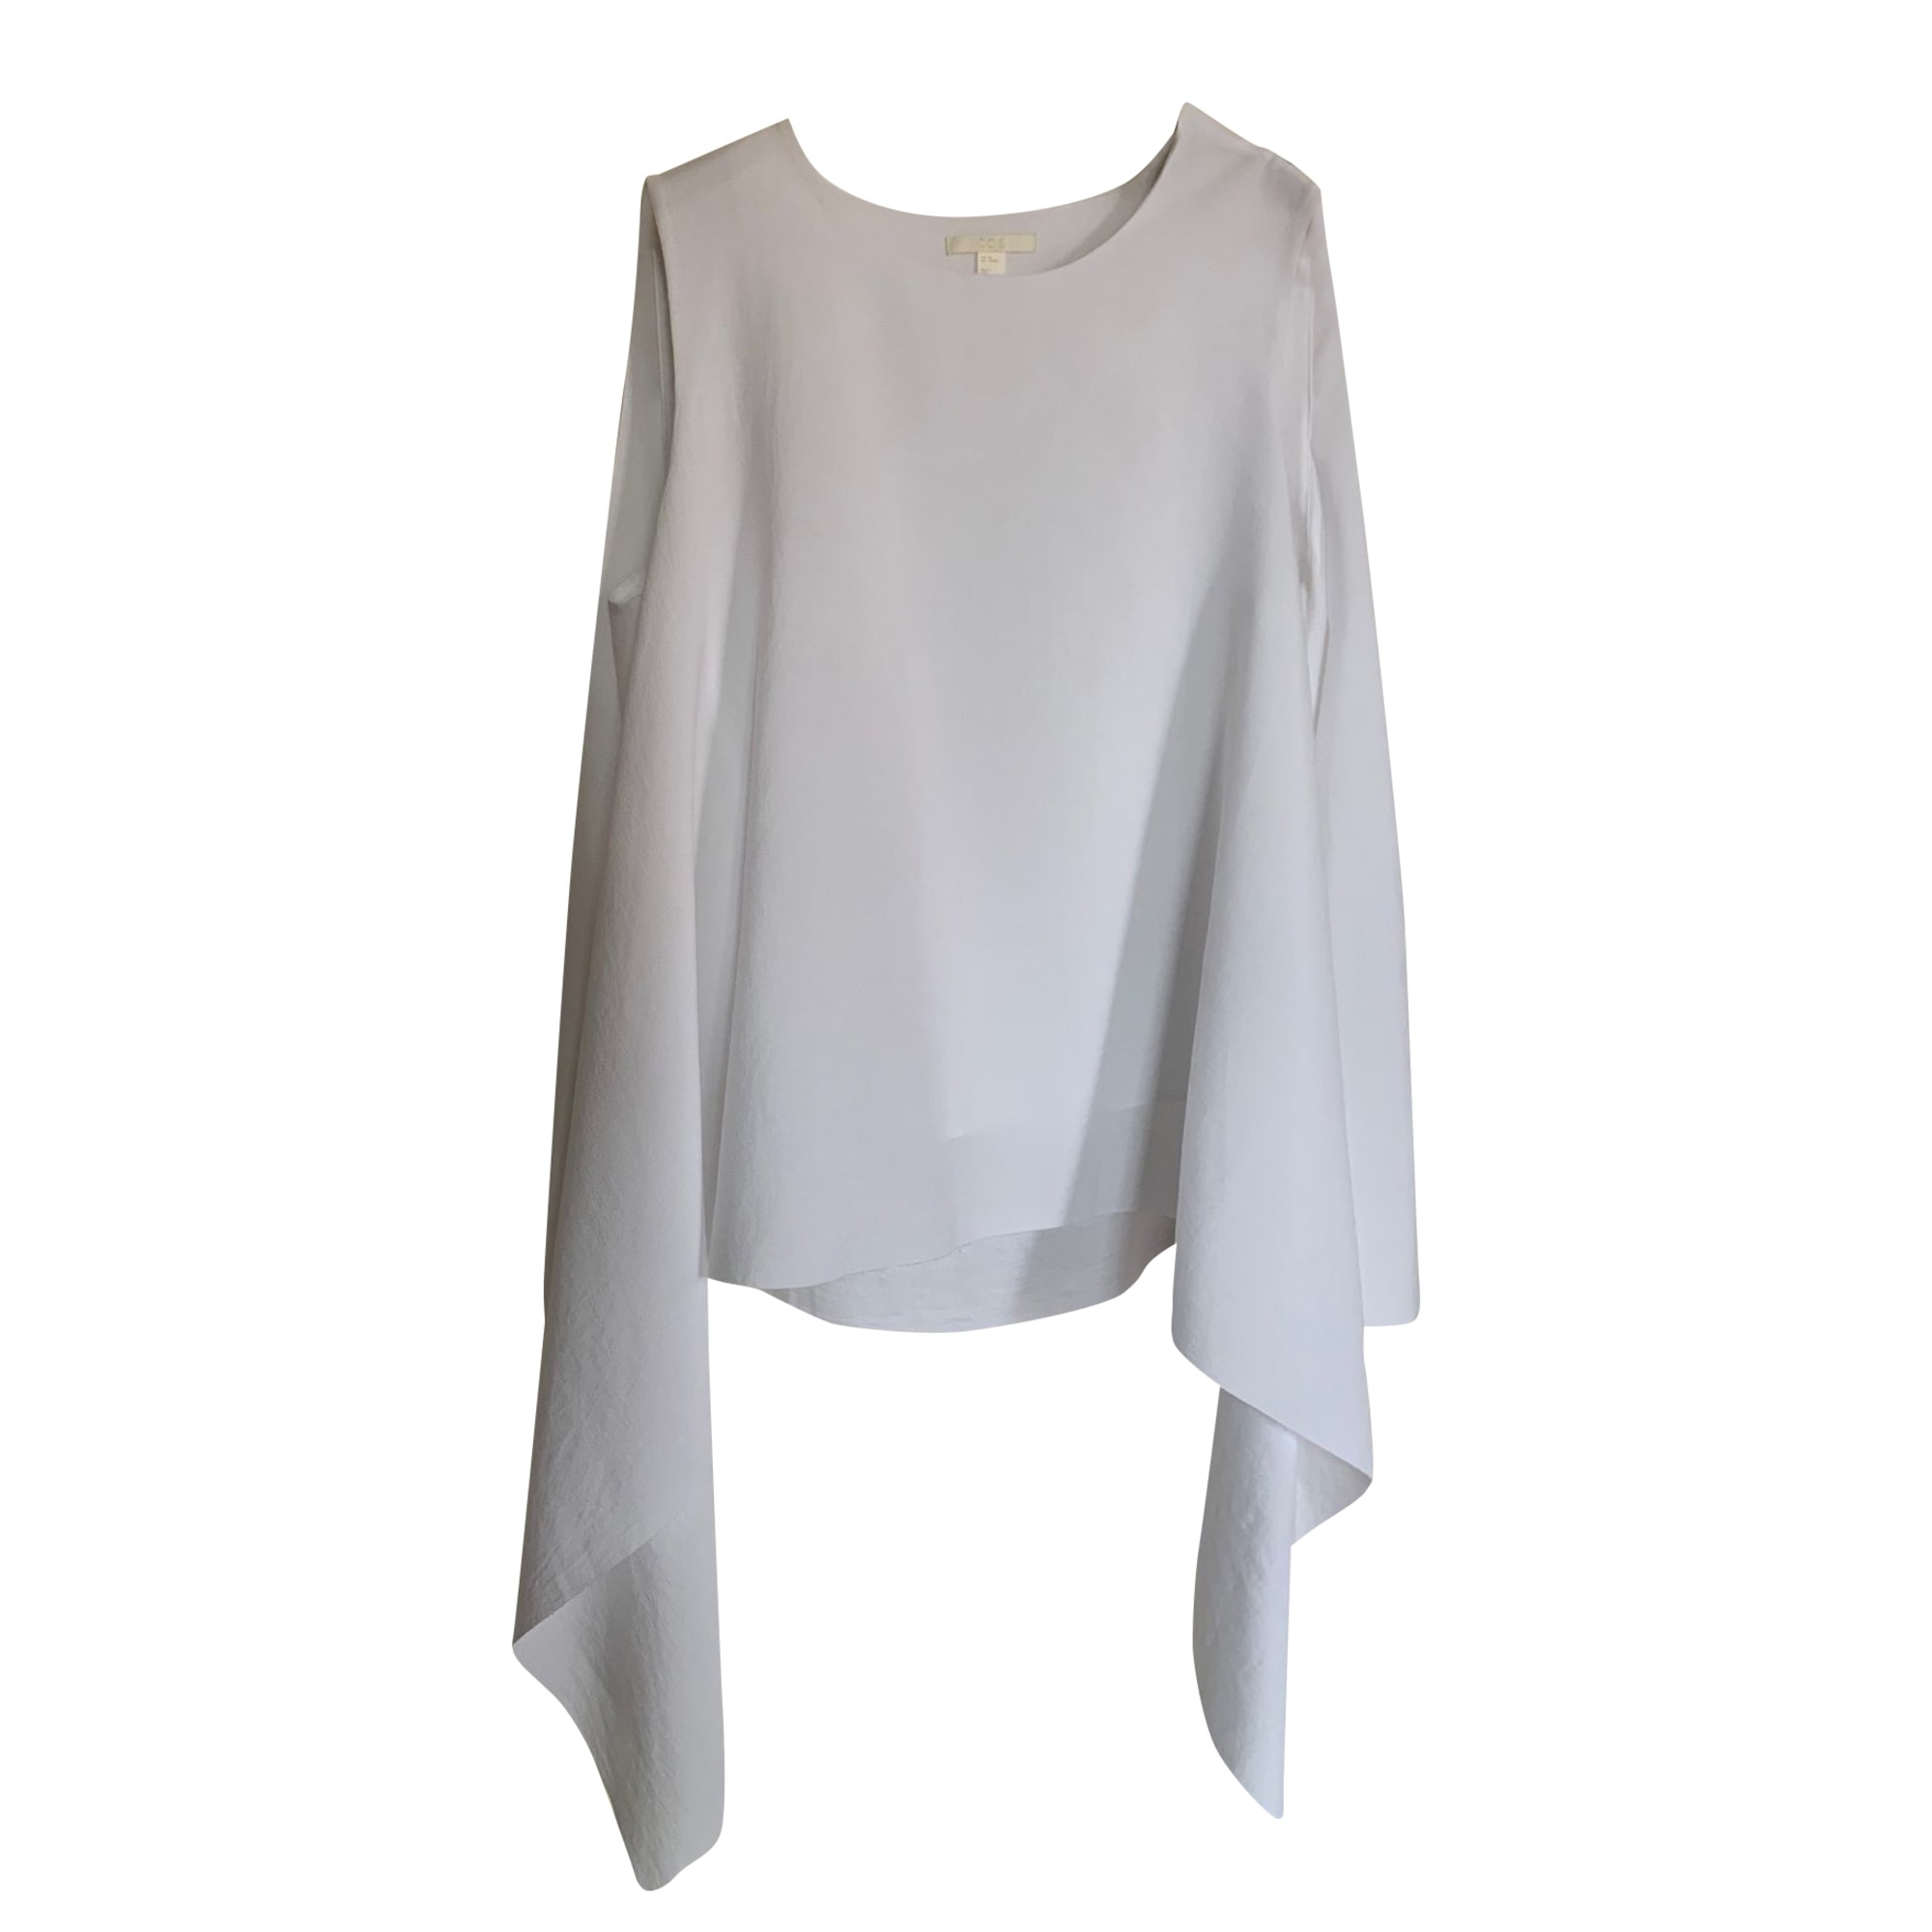 Top, T-shirt COS White, off-white, ecru